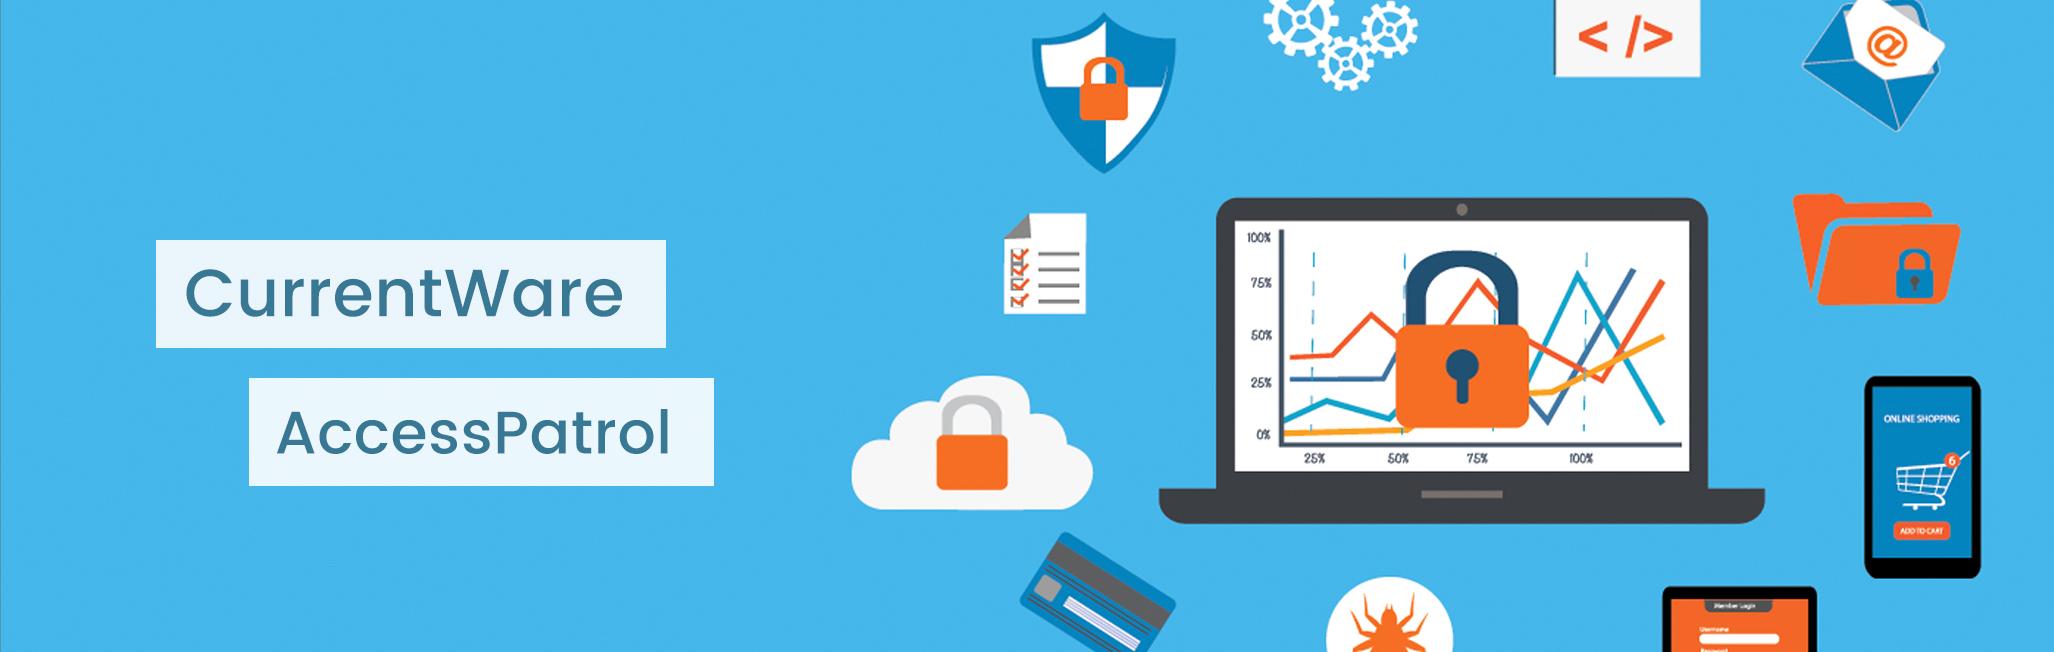 Seguridad informatica bloqueo de pendrive memoria usb softnet sistemas